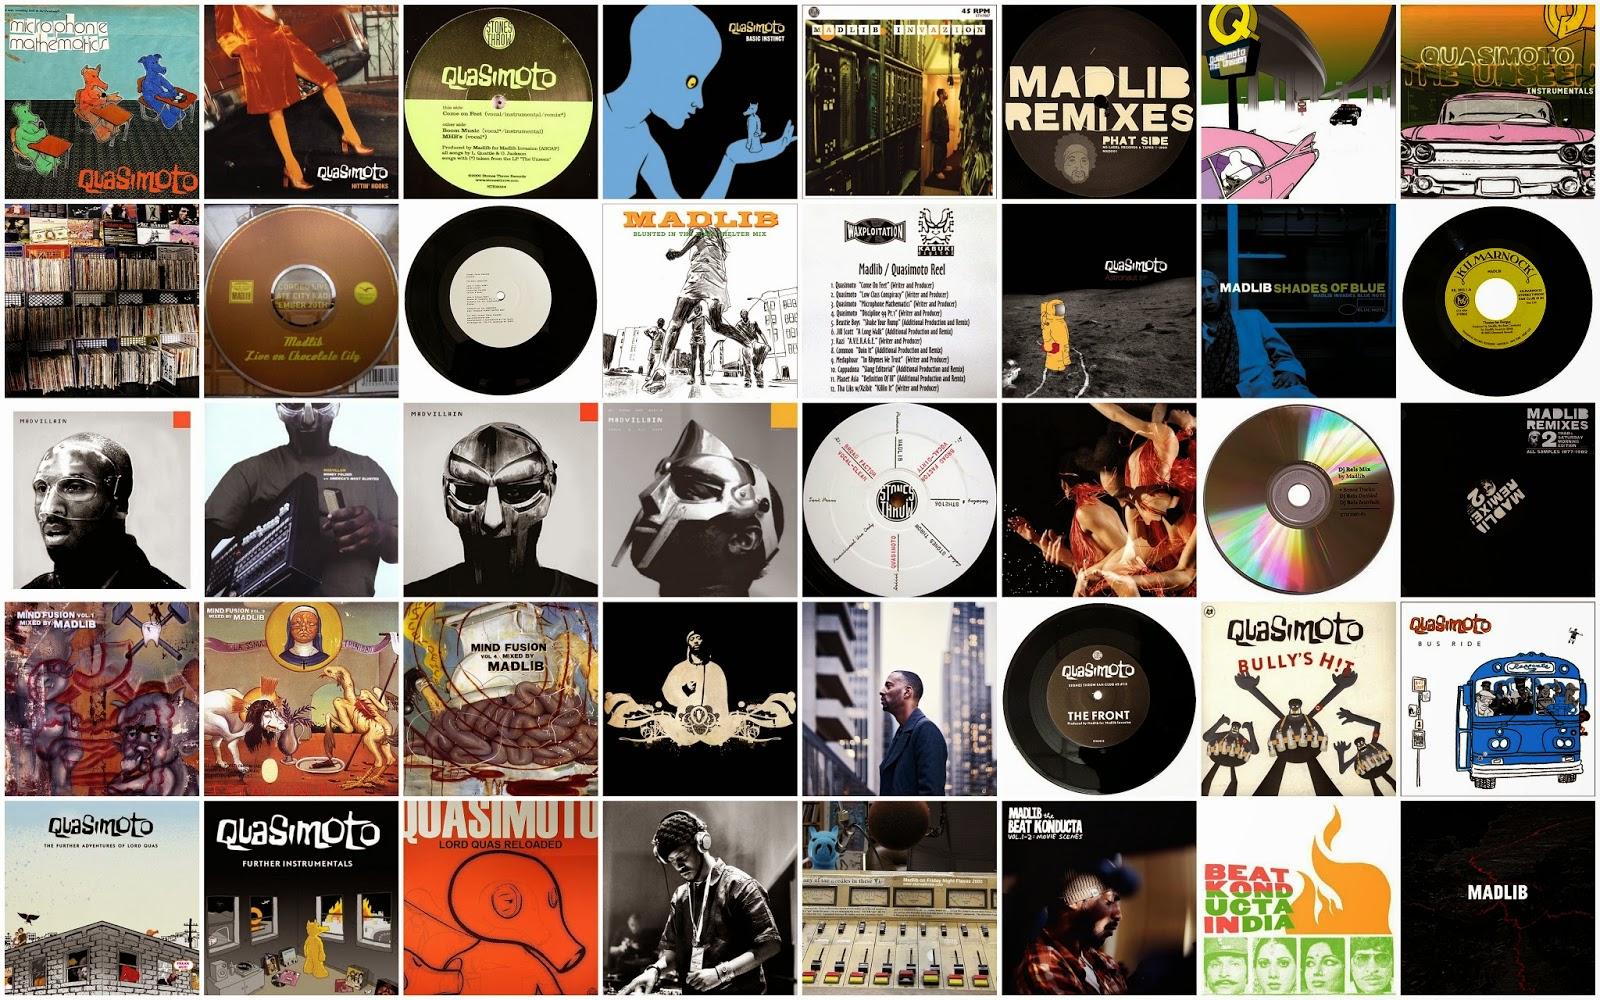 Madlib discografa mediafire mega 1999 2017 producto ilcito martes 16 de agosto de 2016 malvernweather Images